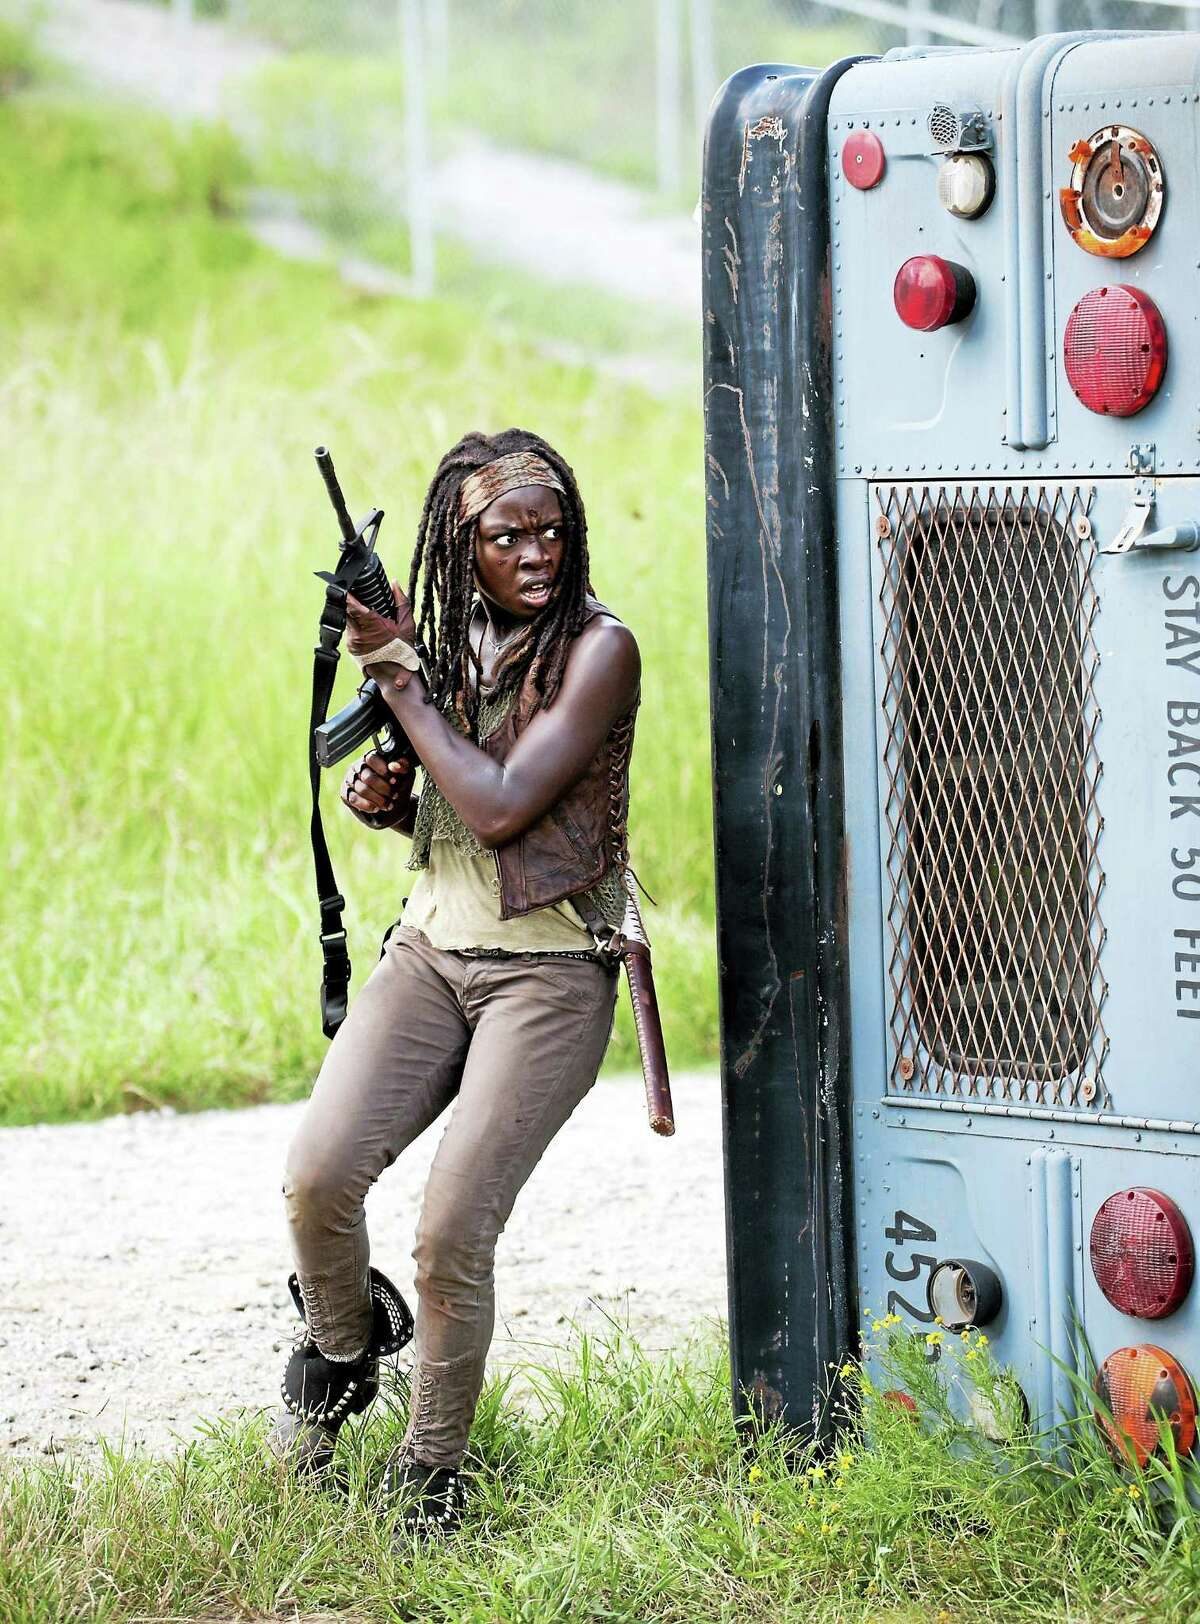 """Walking Dead"" fans know Gurira as Michonne. The AMC series resumes Feb. 8."